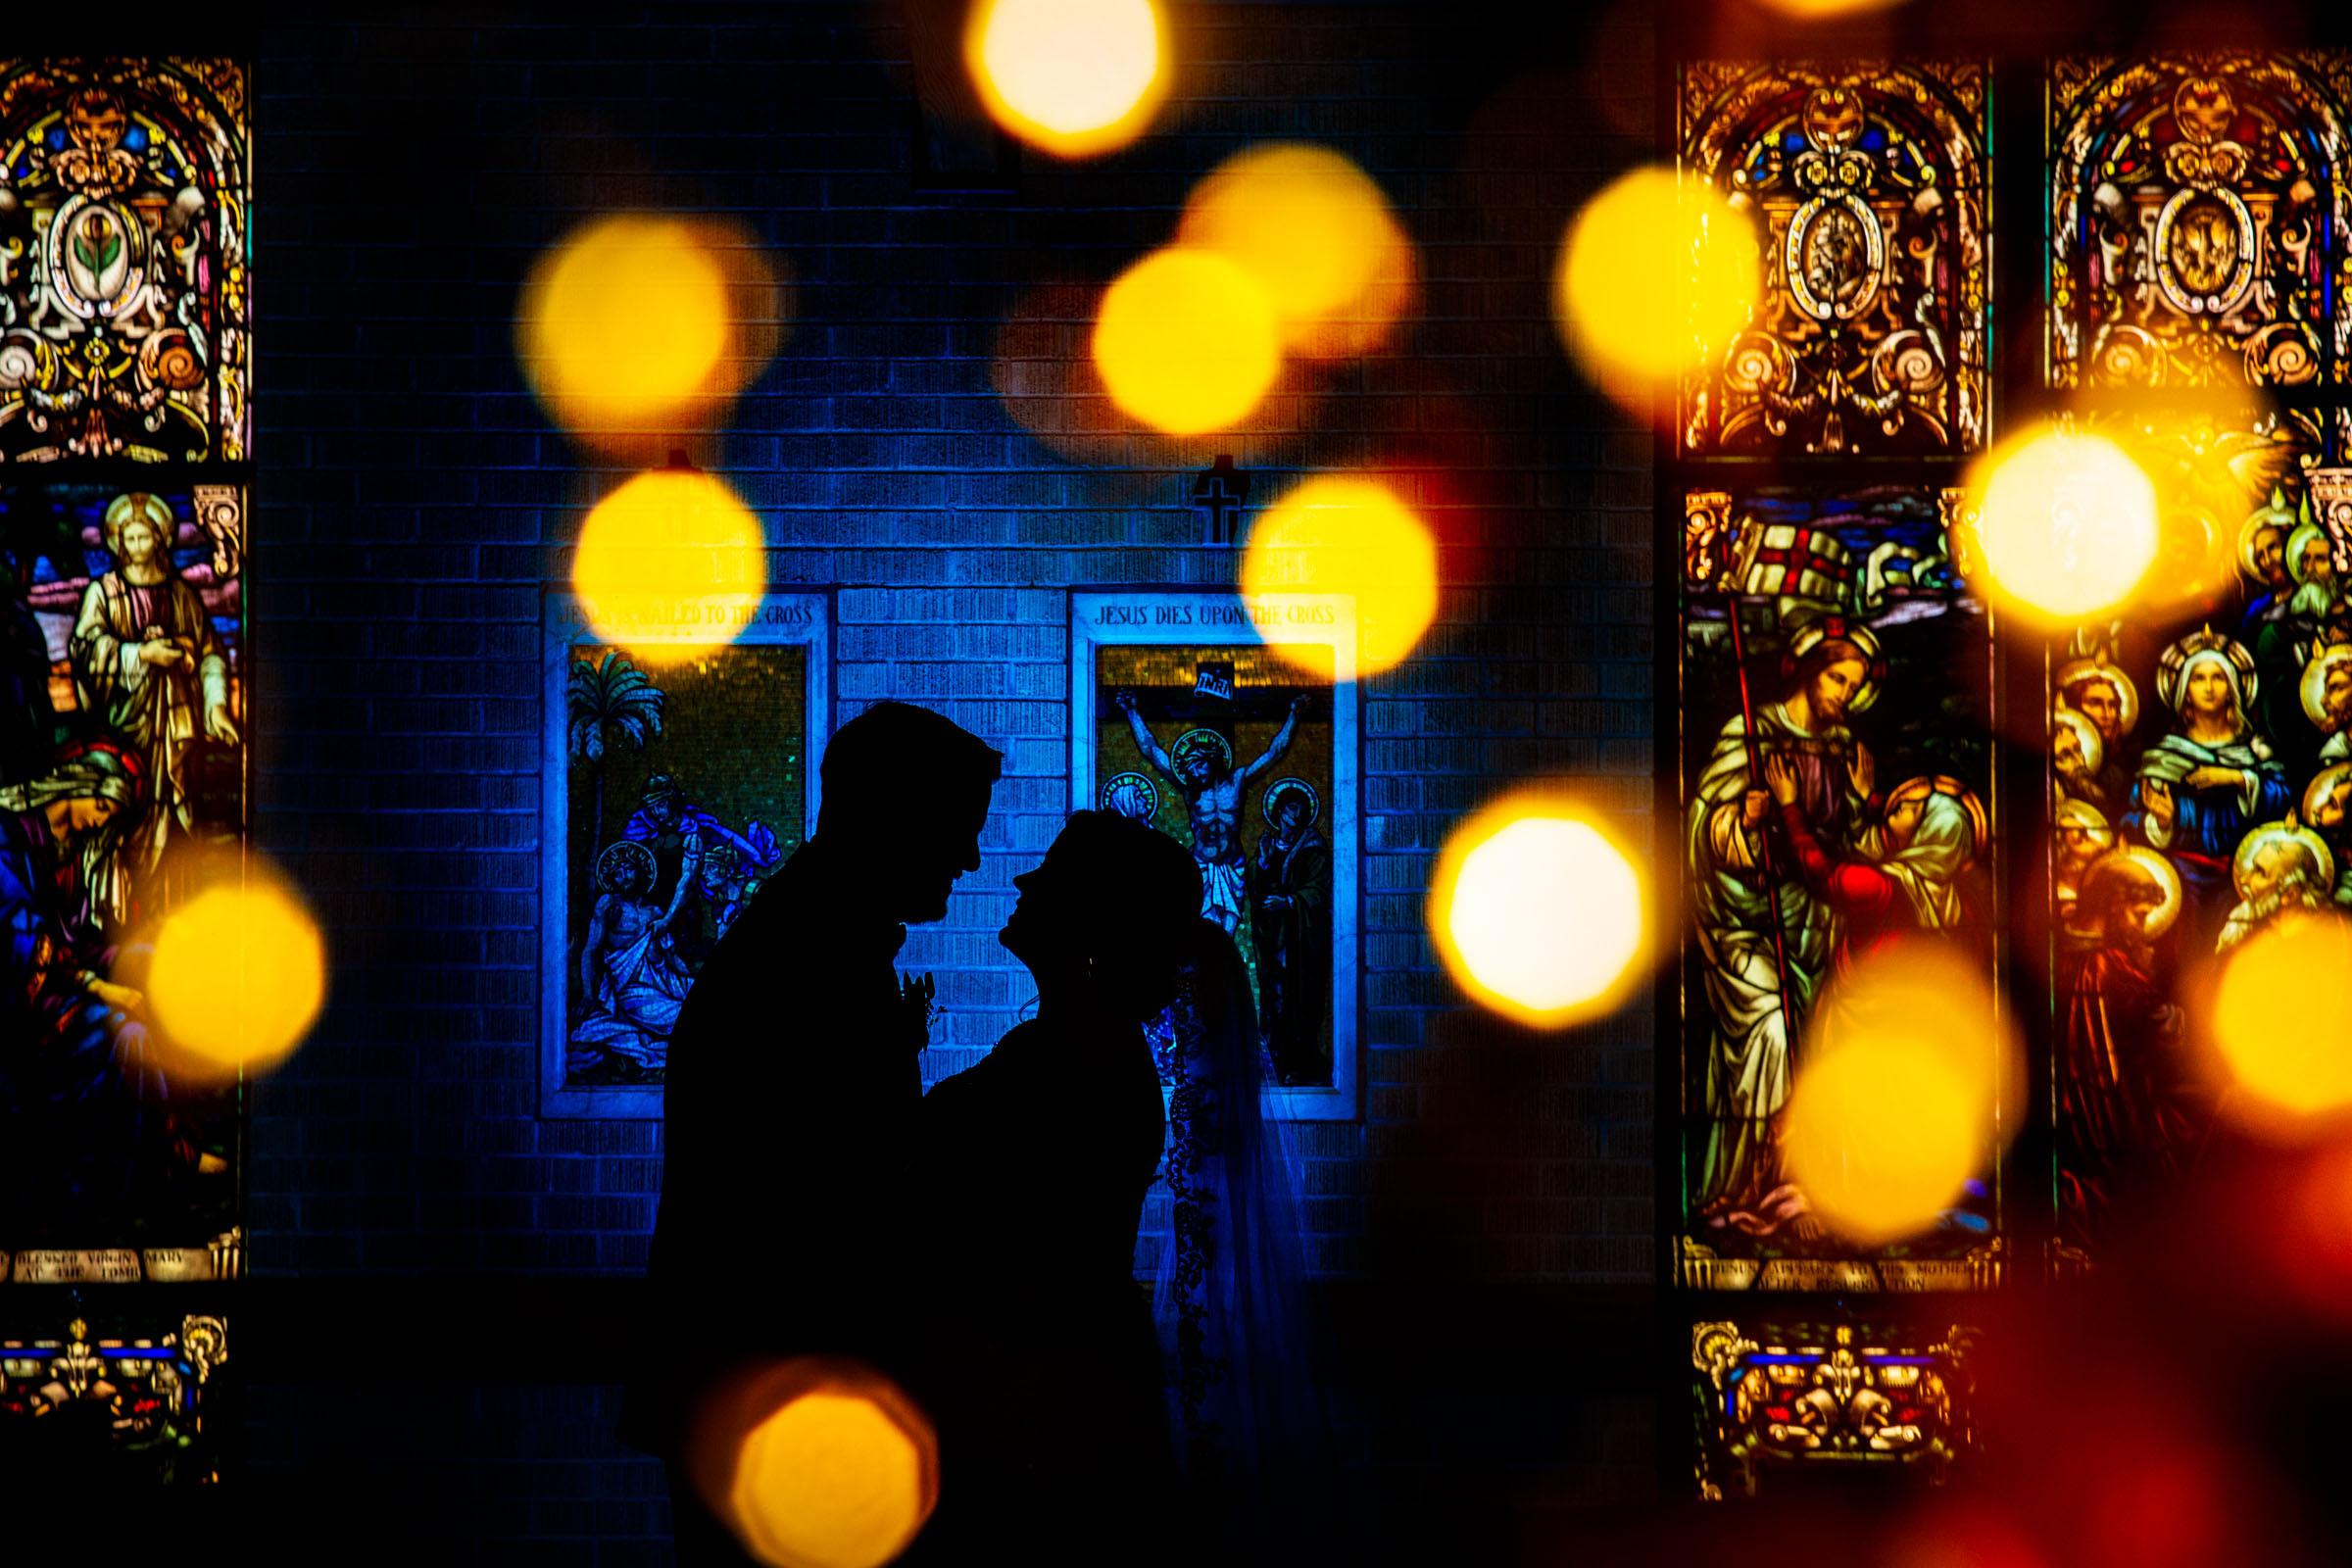 bokeh-light-couple-silhouette-md-photo-films